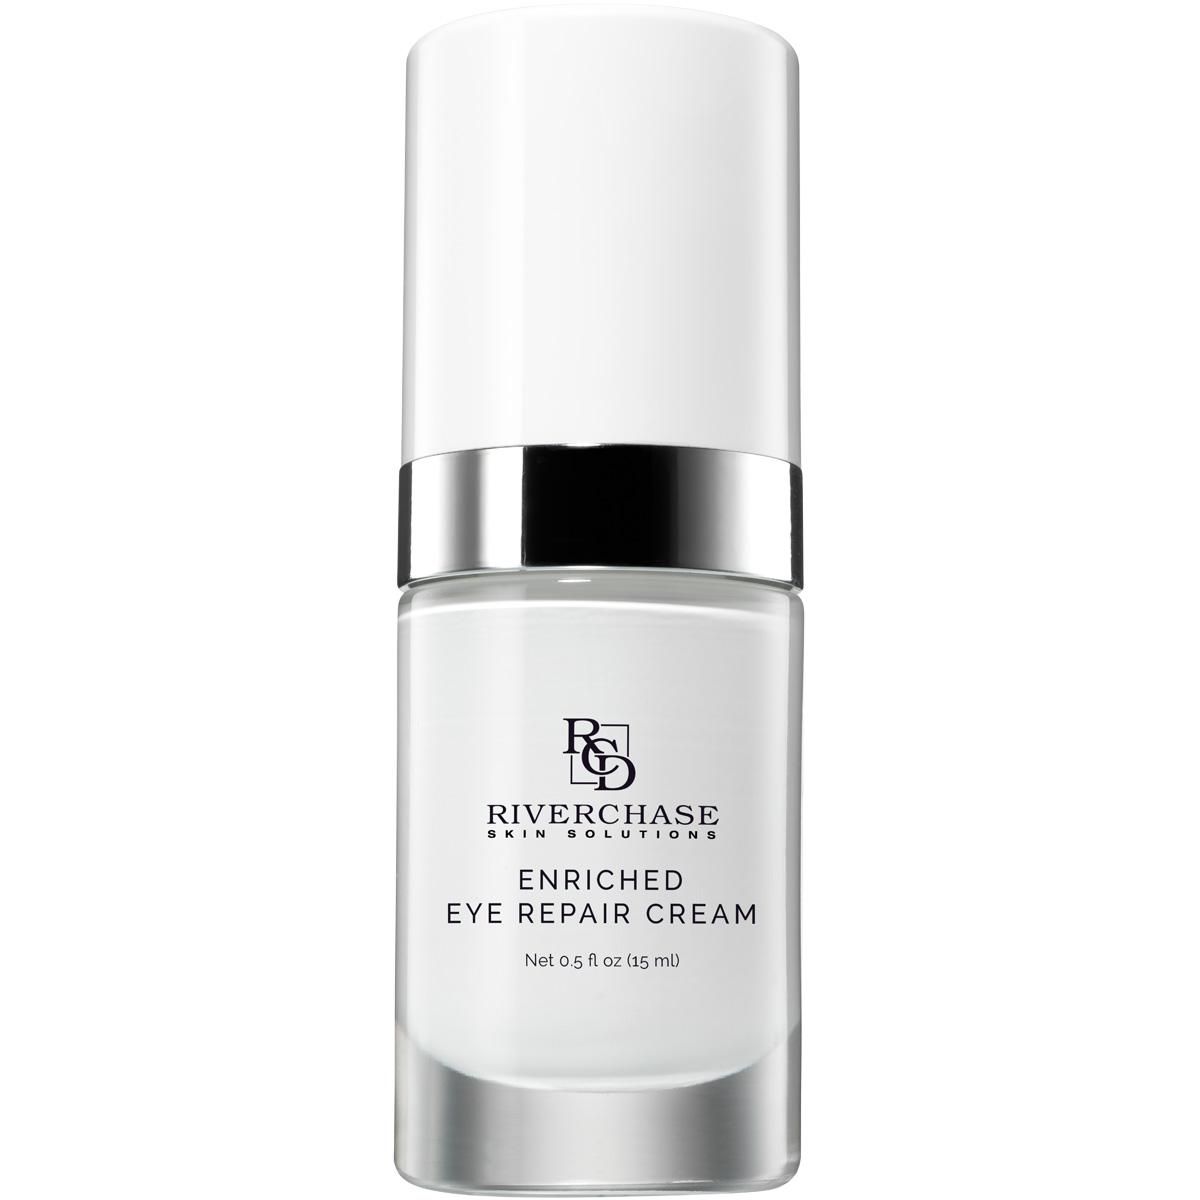 Enriched Eye Repair Cream